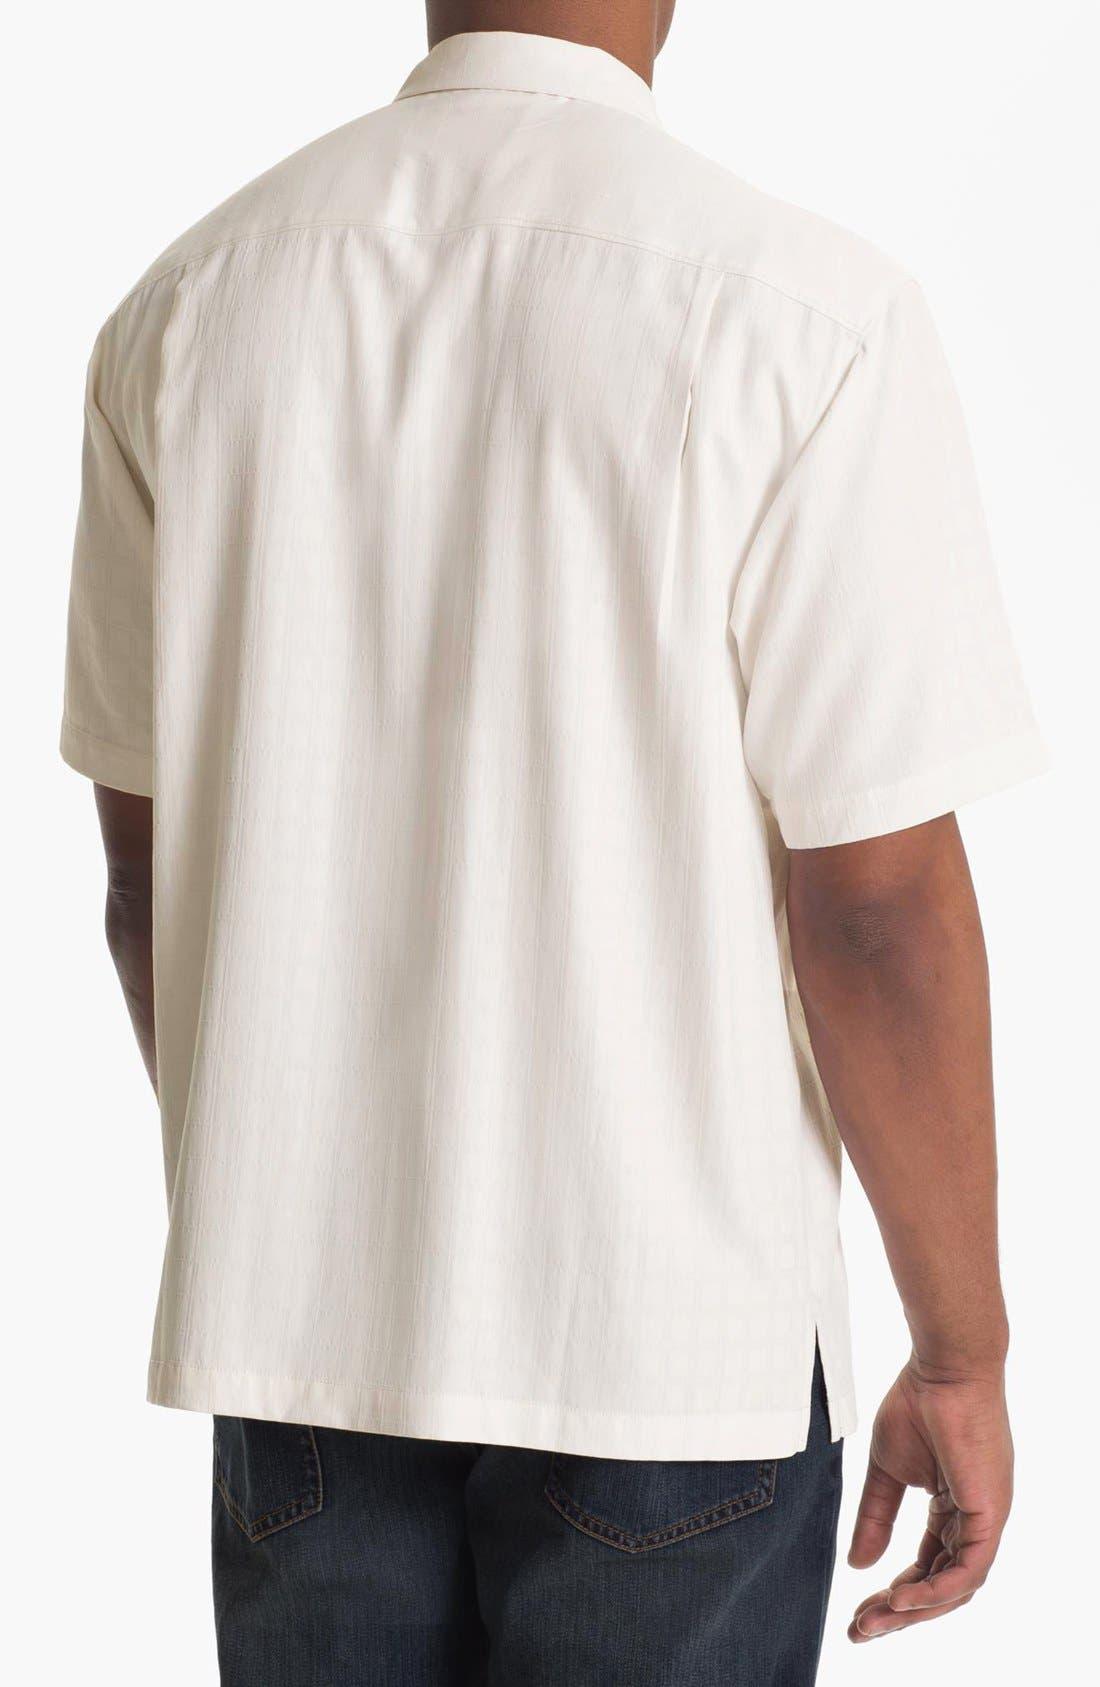 Alternate Image 2  - Tommy Bahama 'Four Amigos' Silk Campshirt (Big & Tall)